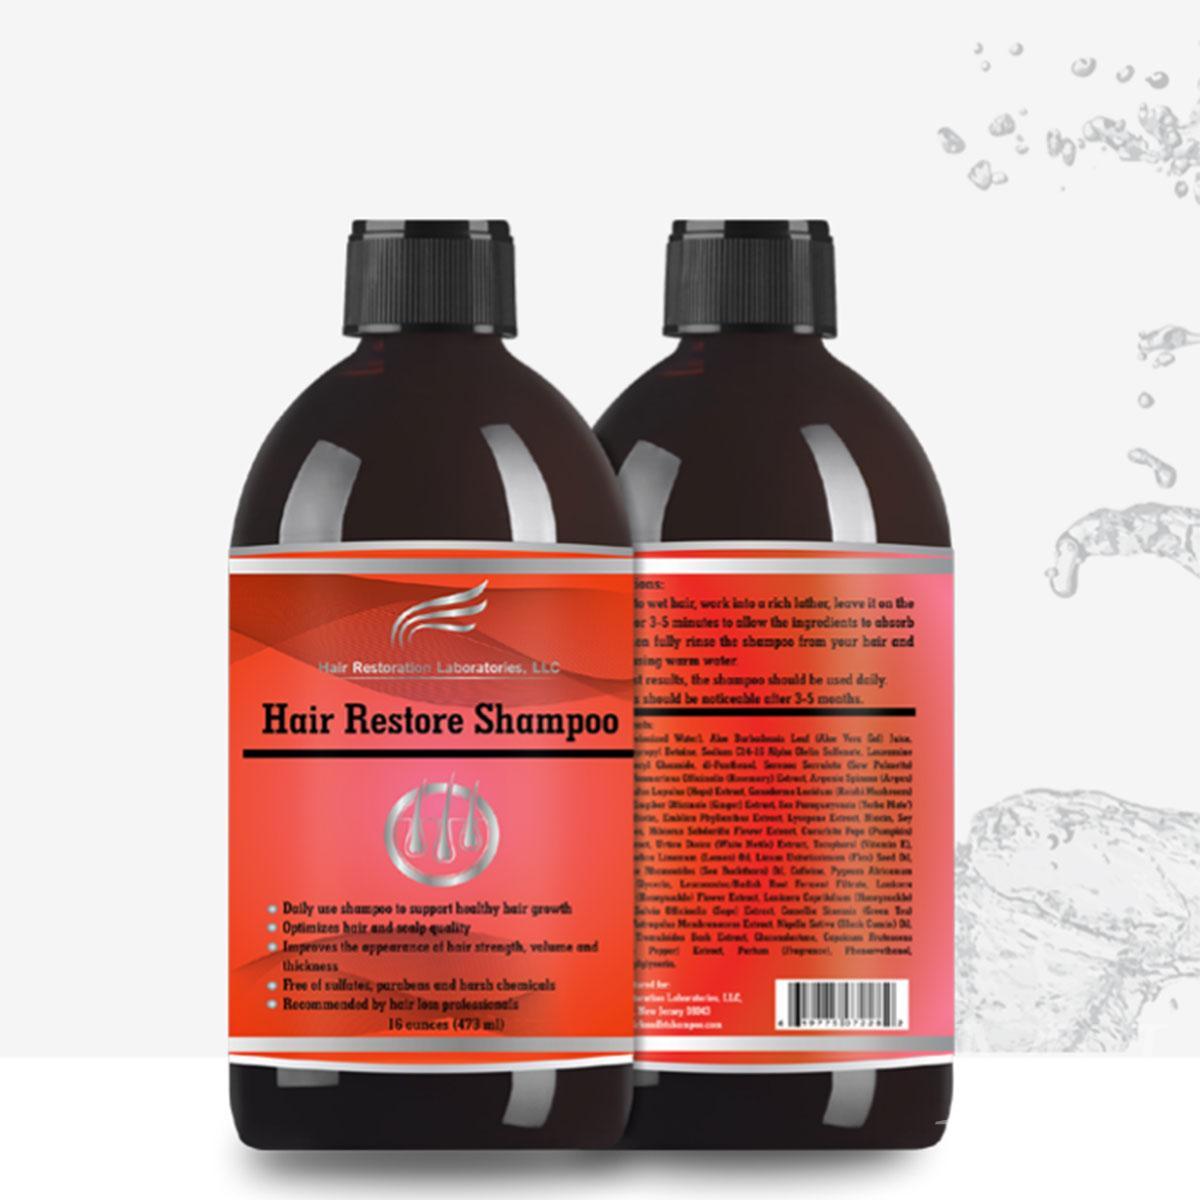 hair-restoration-laboratories-man-for-himself